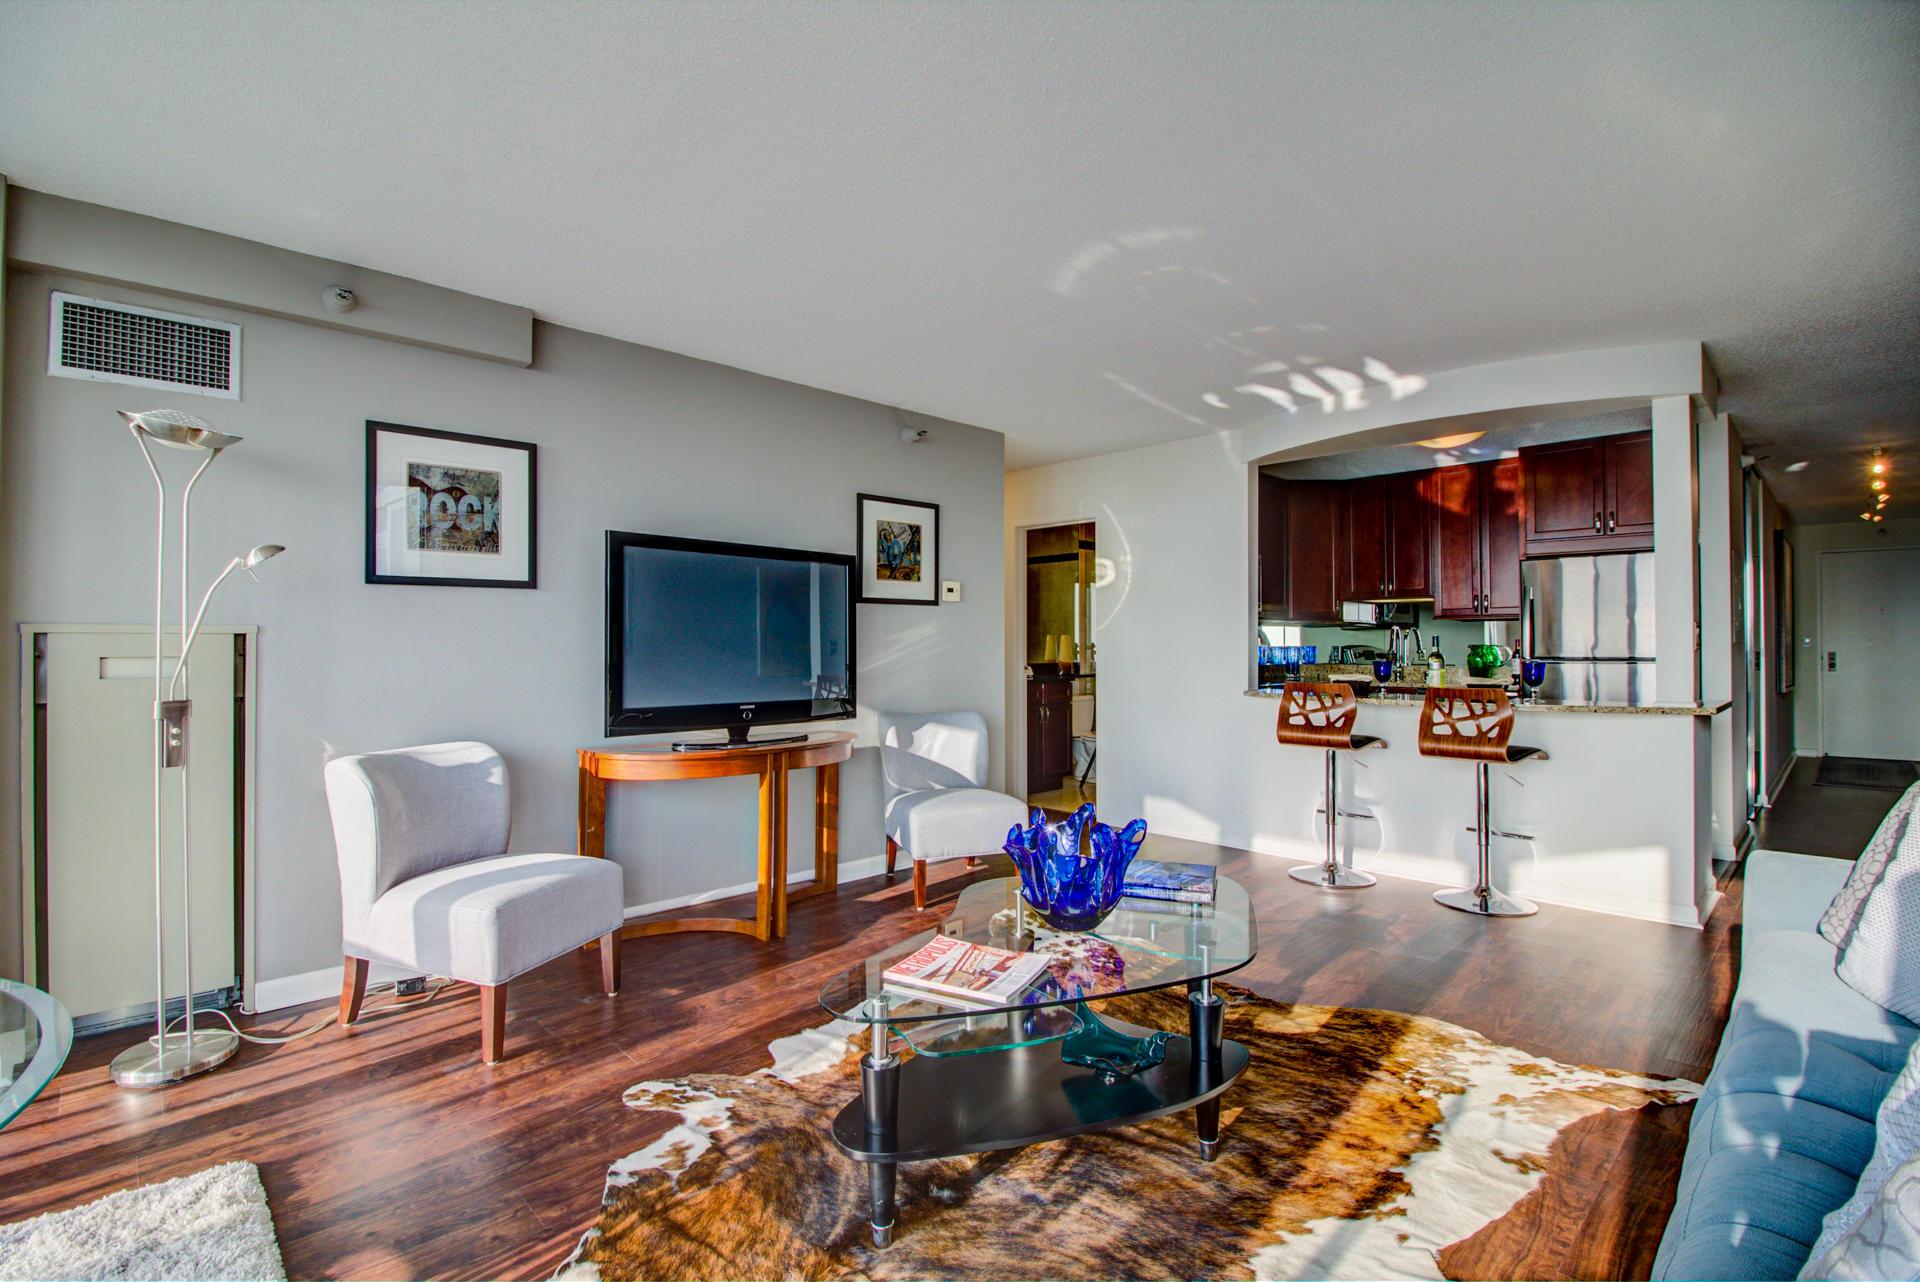 1660 Prospect Ave, Milwaukee, Wisconsin 53202, 2 Bedrooms Bedrooms, 4 Rooms Rooms,2 BathroomsBathrooms,Condominiums,For Sale,Prospect Ave,26,1619101